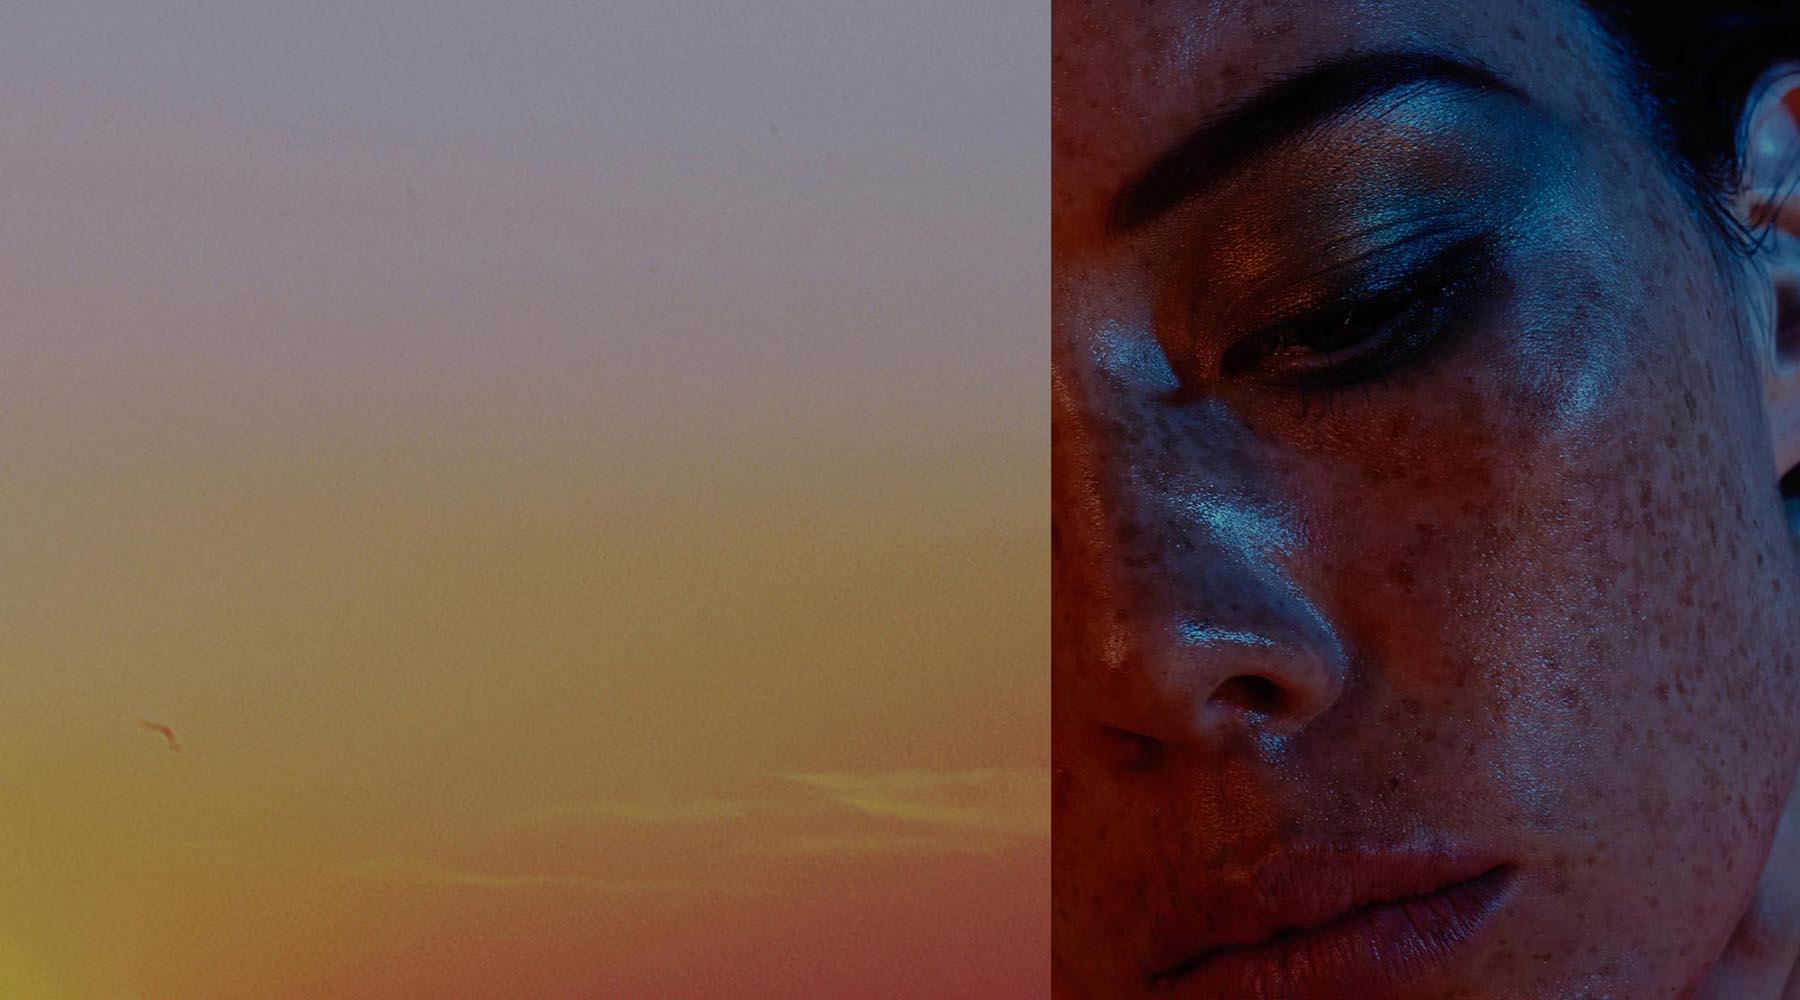 Noel McLaughlin Sunrise & Portrait Close Up